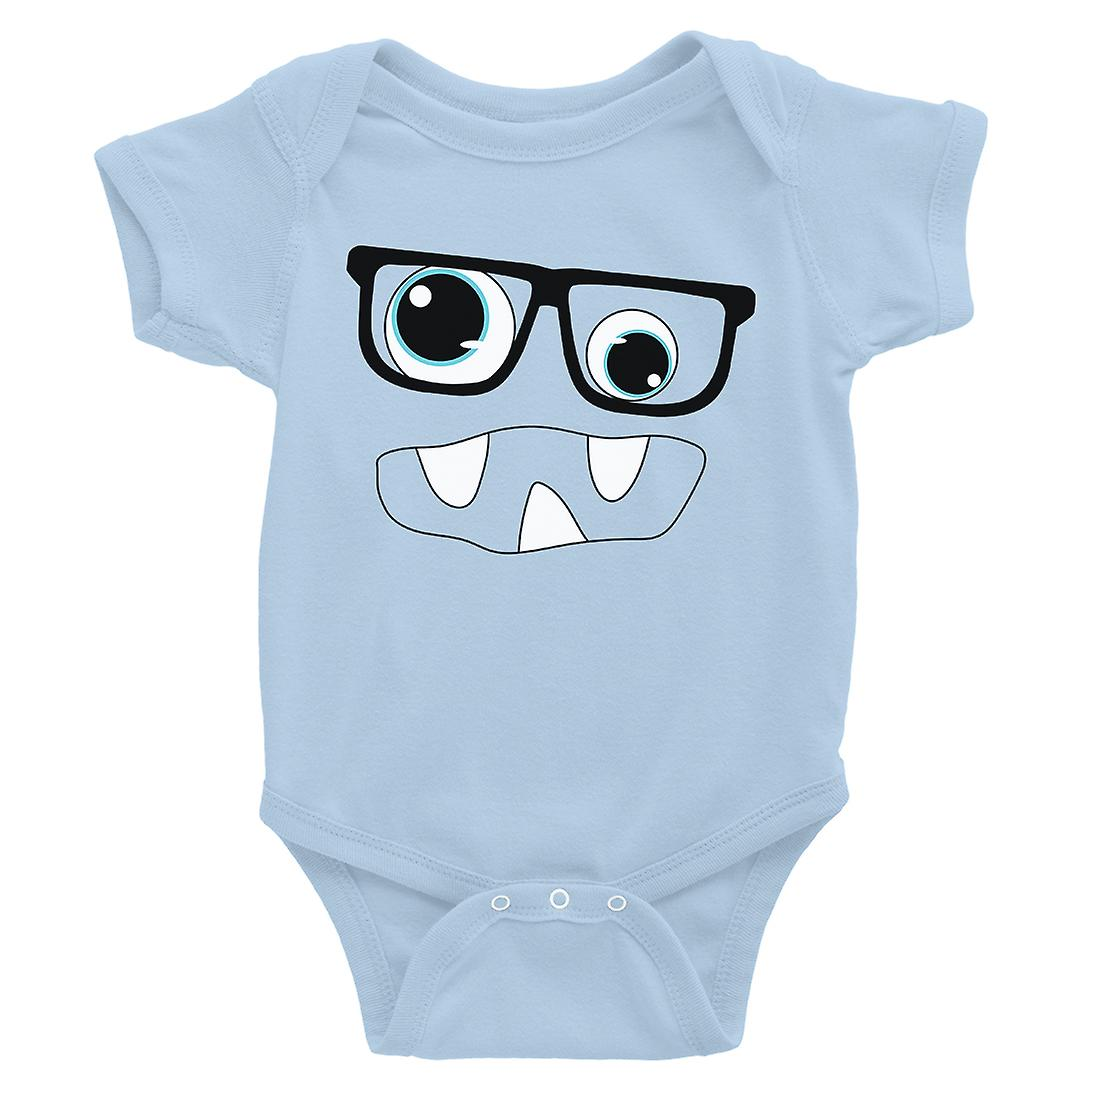 Baby baby raskere Moster fødselsdag gave Baby T skjorte